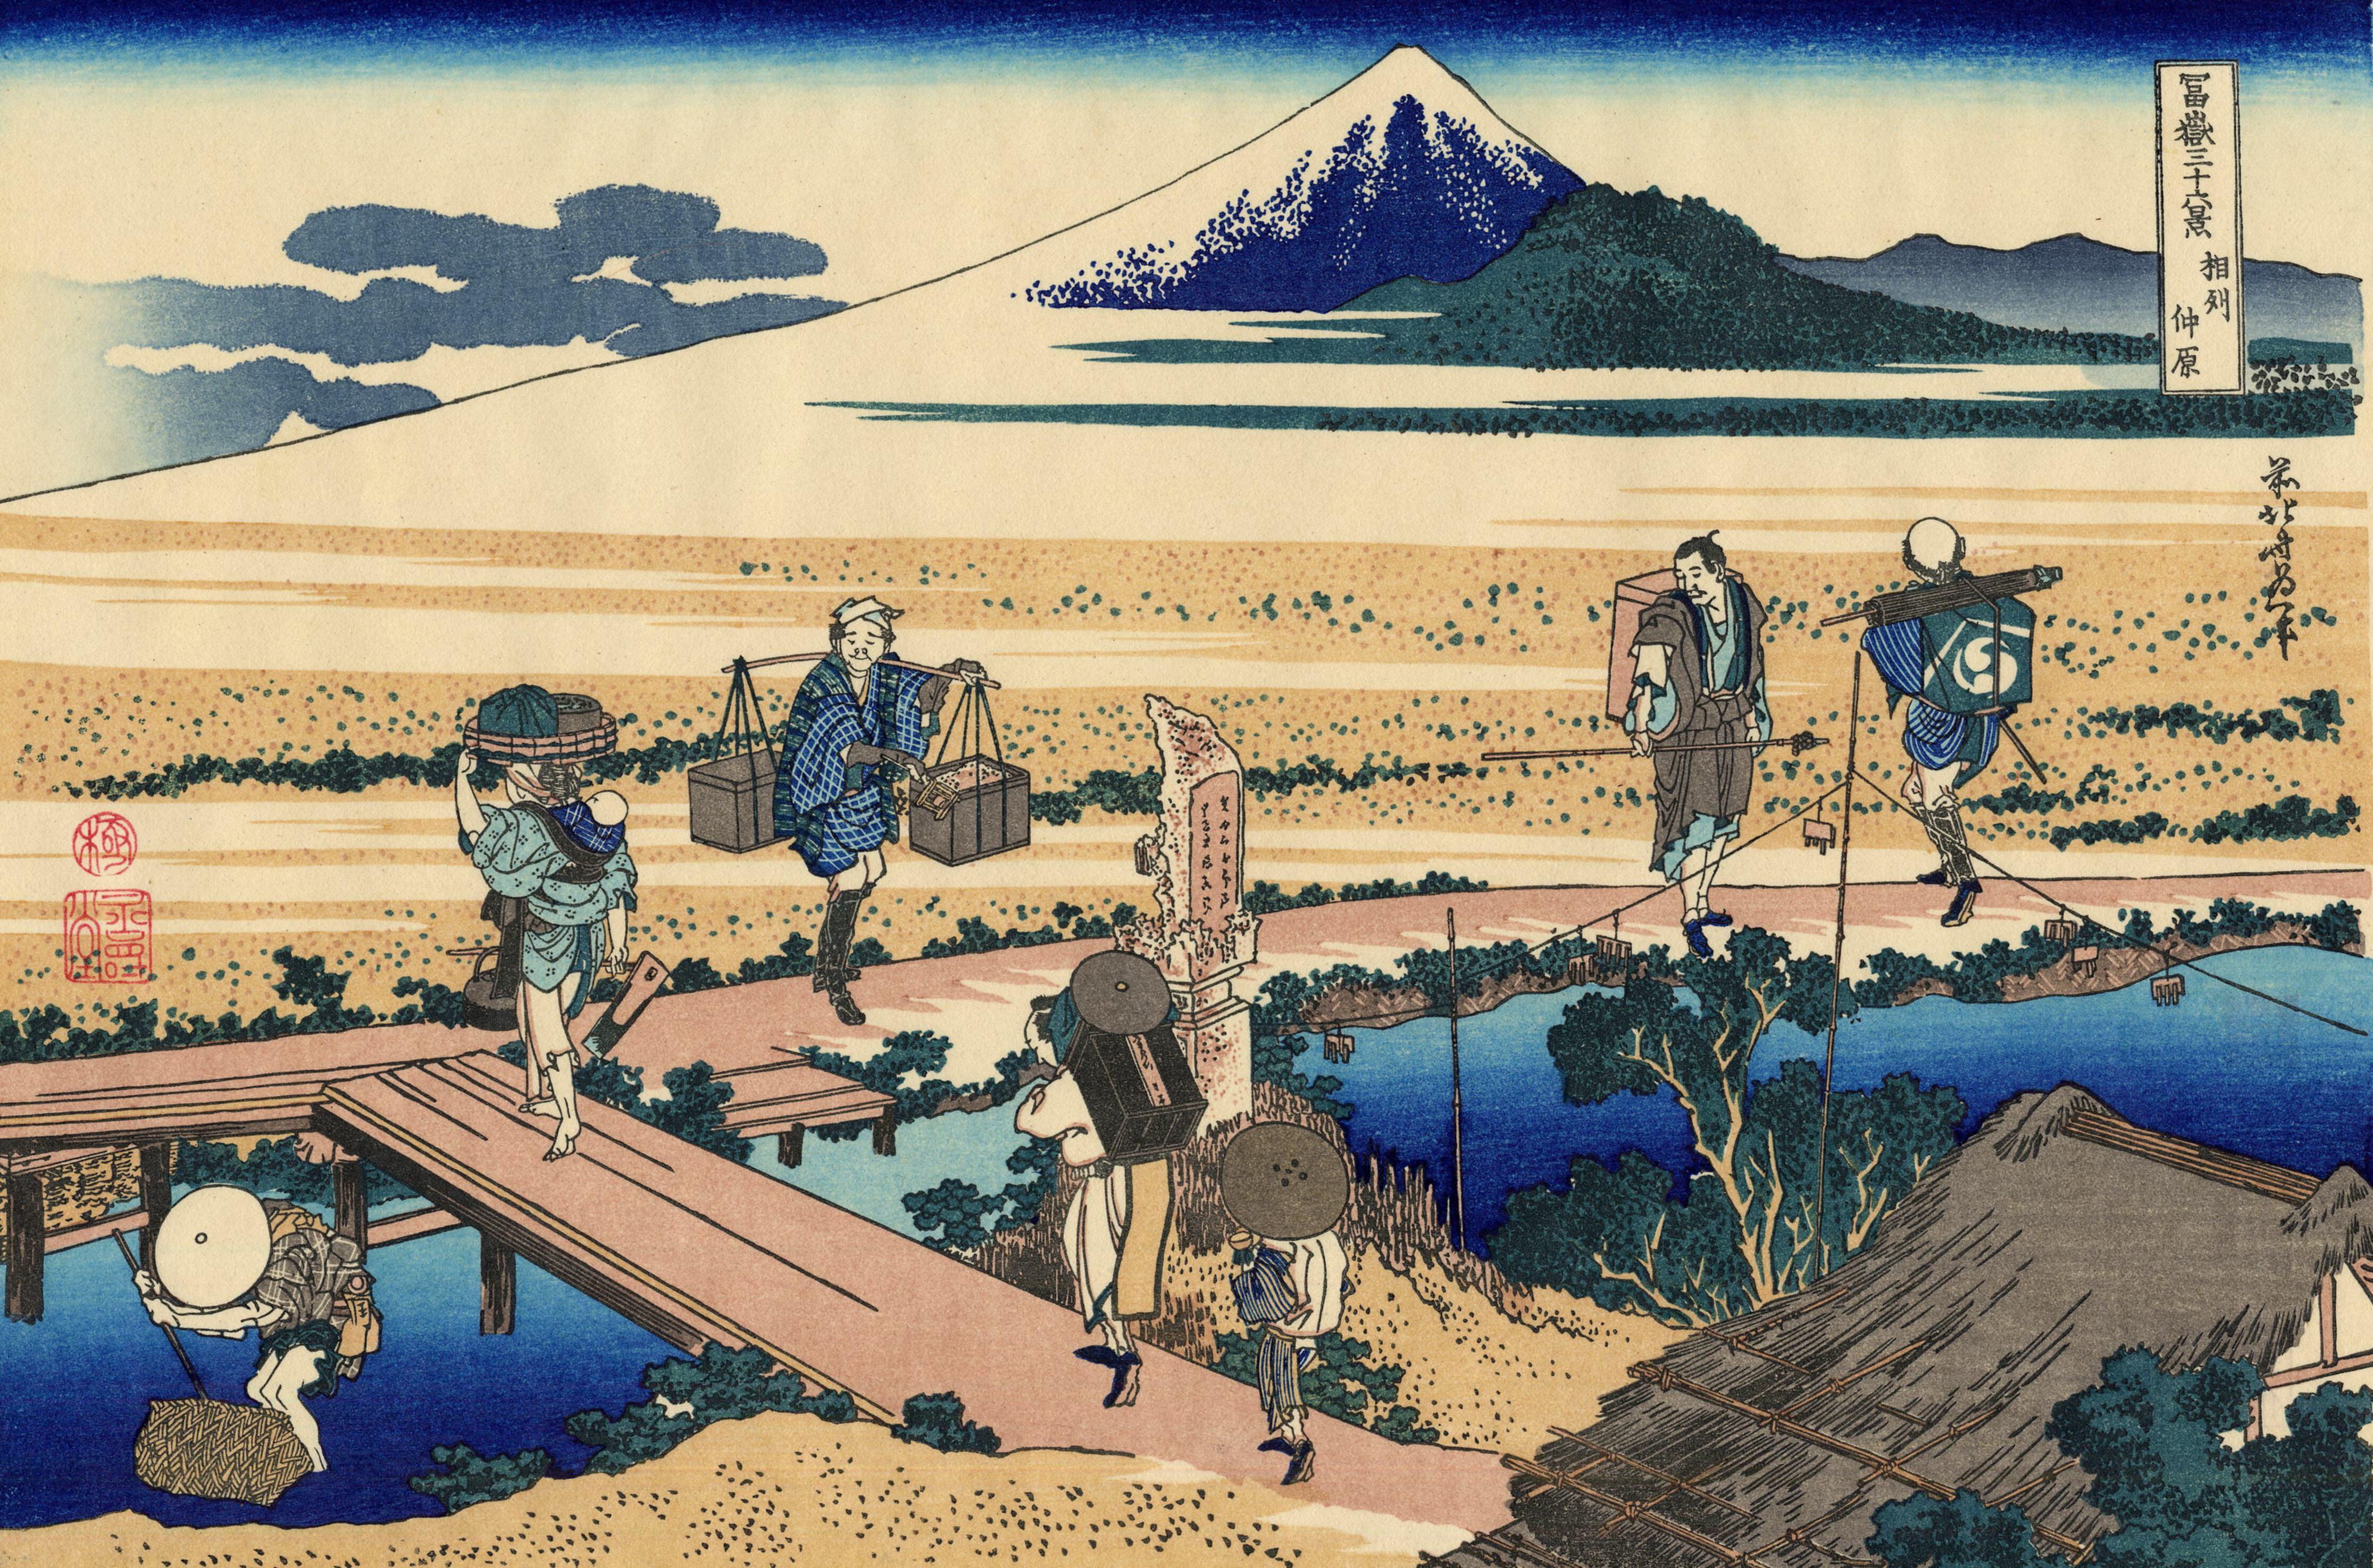 hokusai_manga_wrestling_la55rg444e